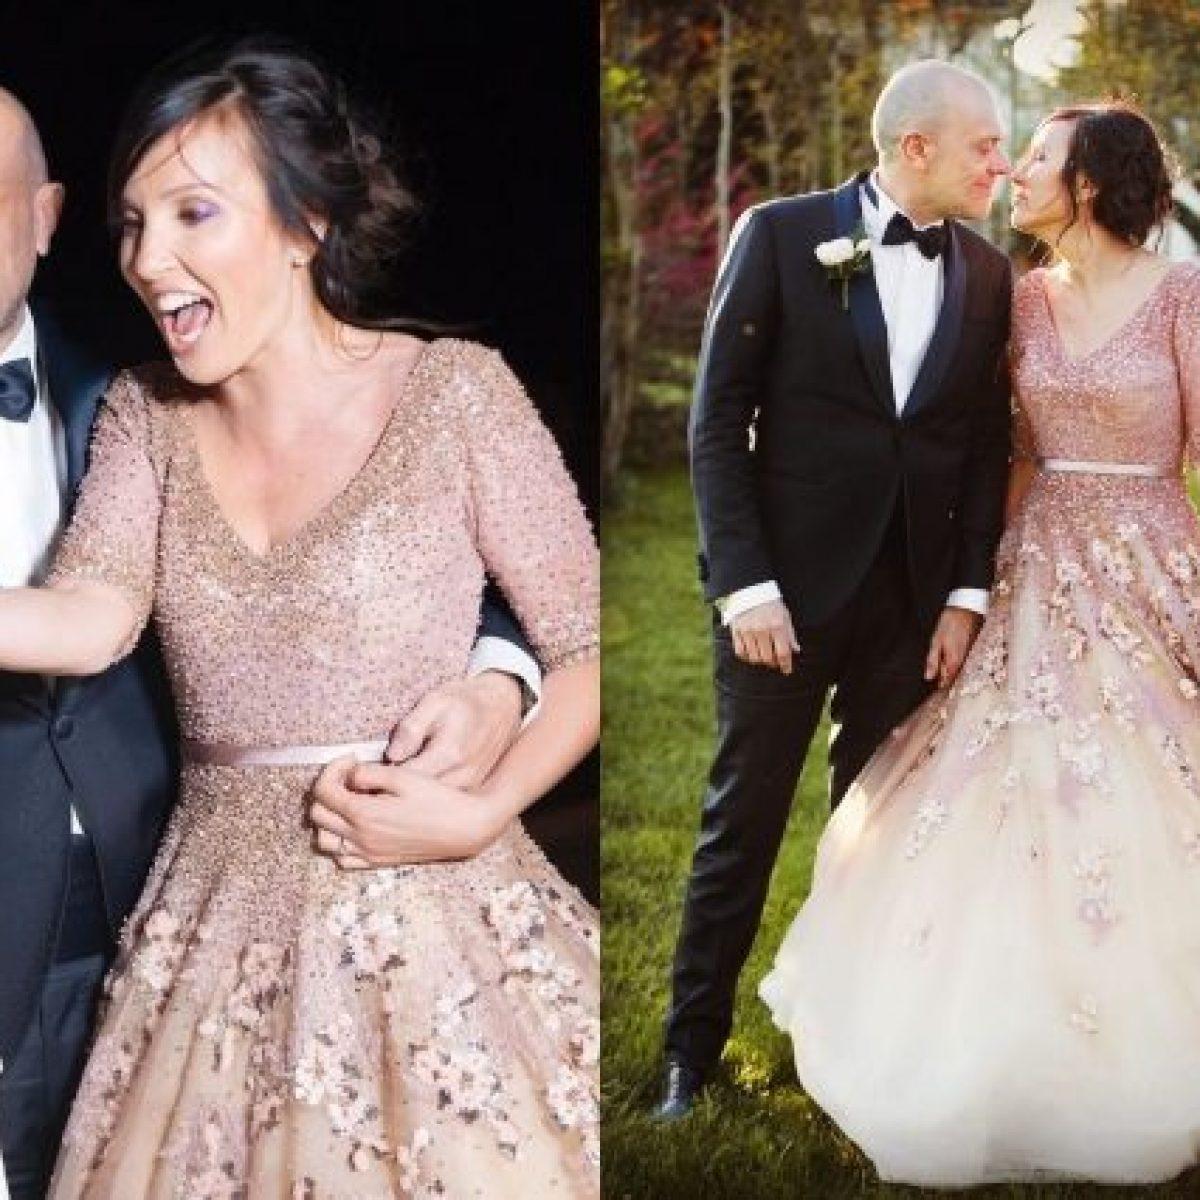 fe6606b2c094 Max Pezzali sposa Debora Pelamatti  lui in smoking